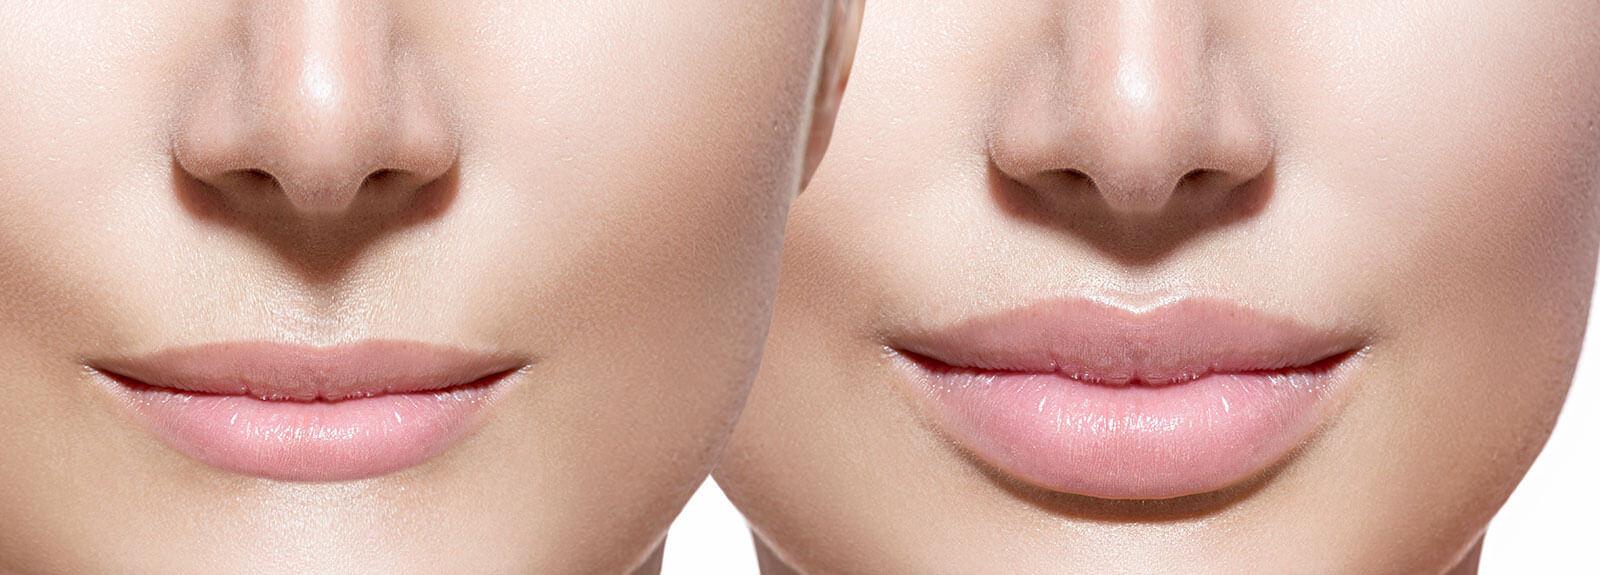 hedonai-promocion-relleno-labios-ejemplo